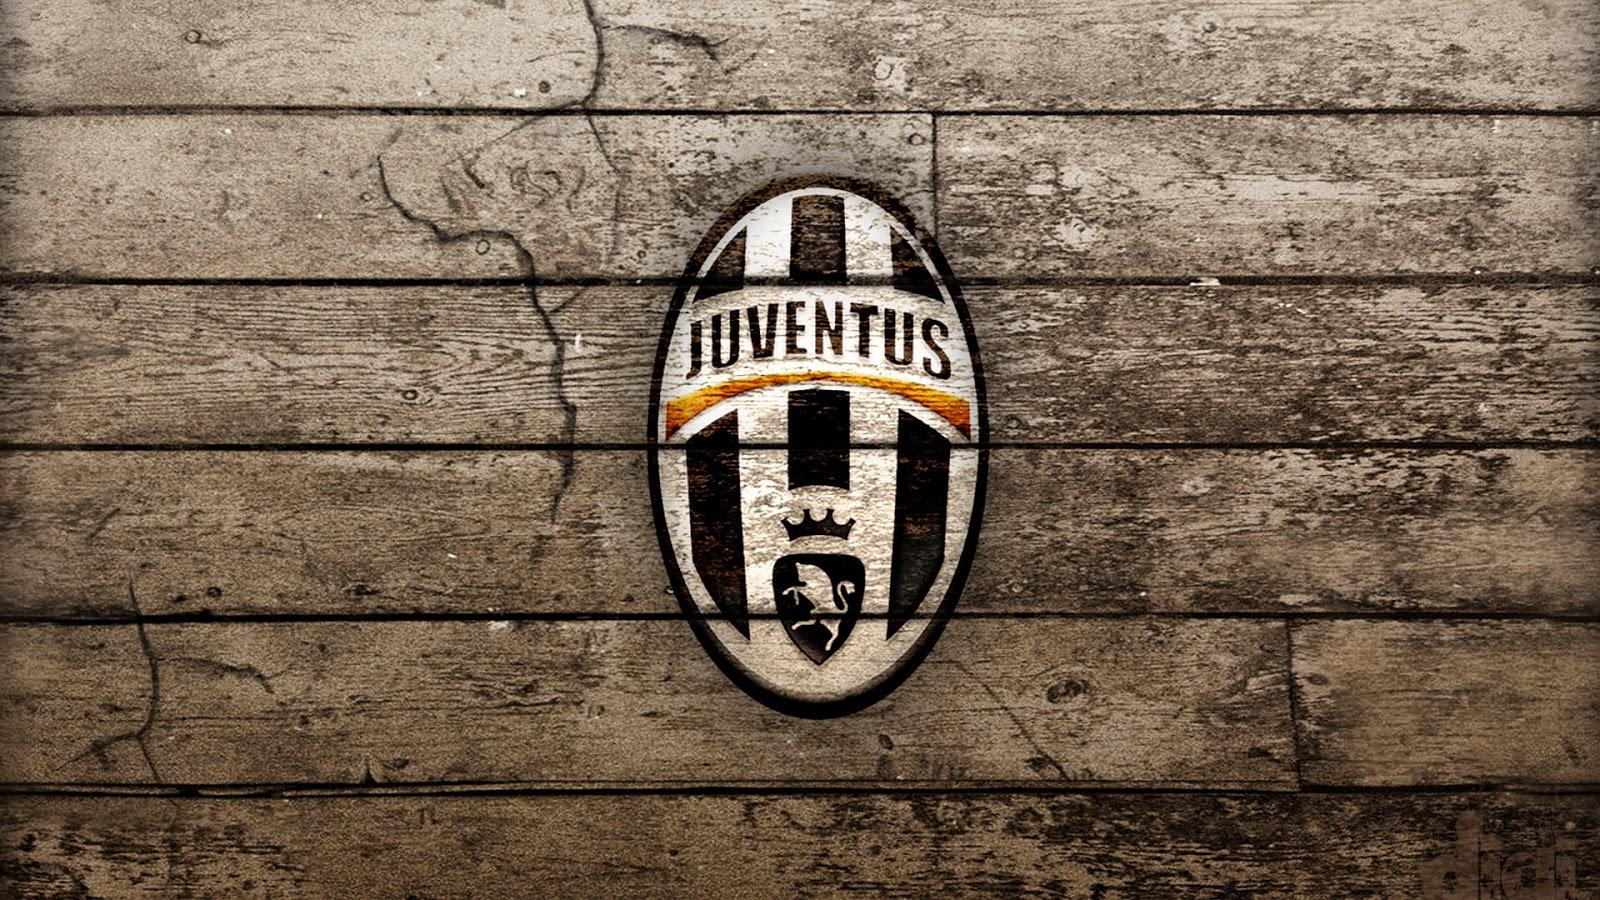 Download 3d Wallpaper Apk Juventus Football Club Wallpaper Football Wallpaper Hd